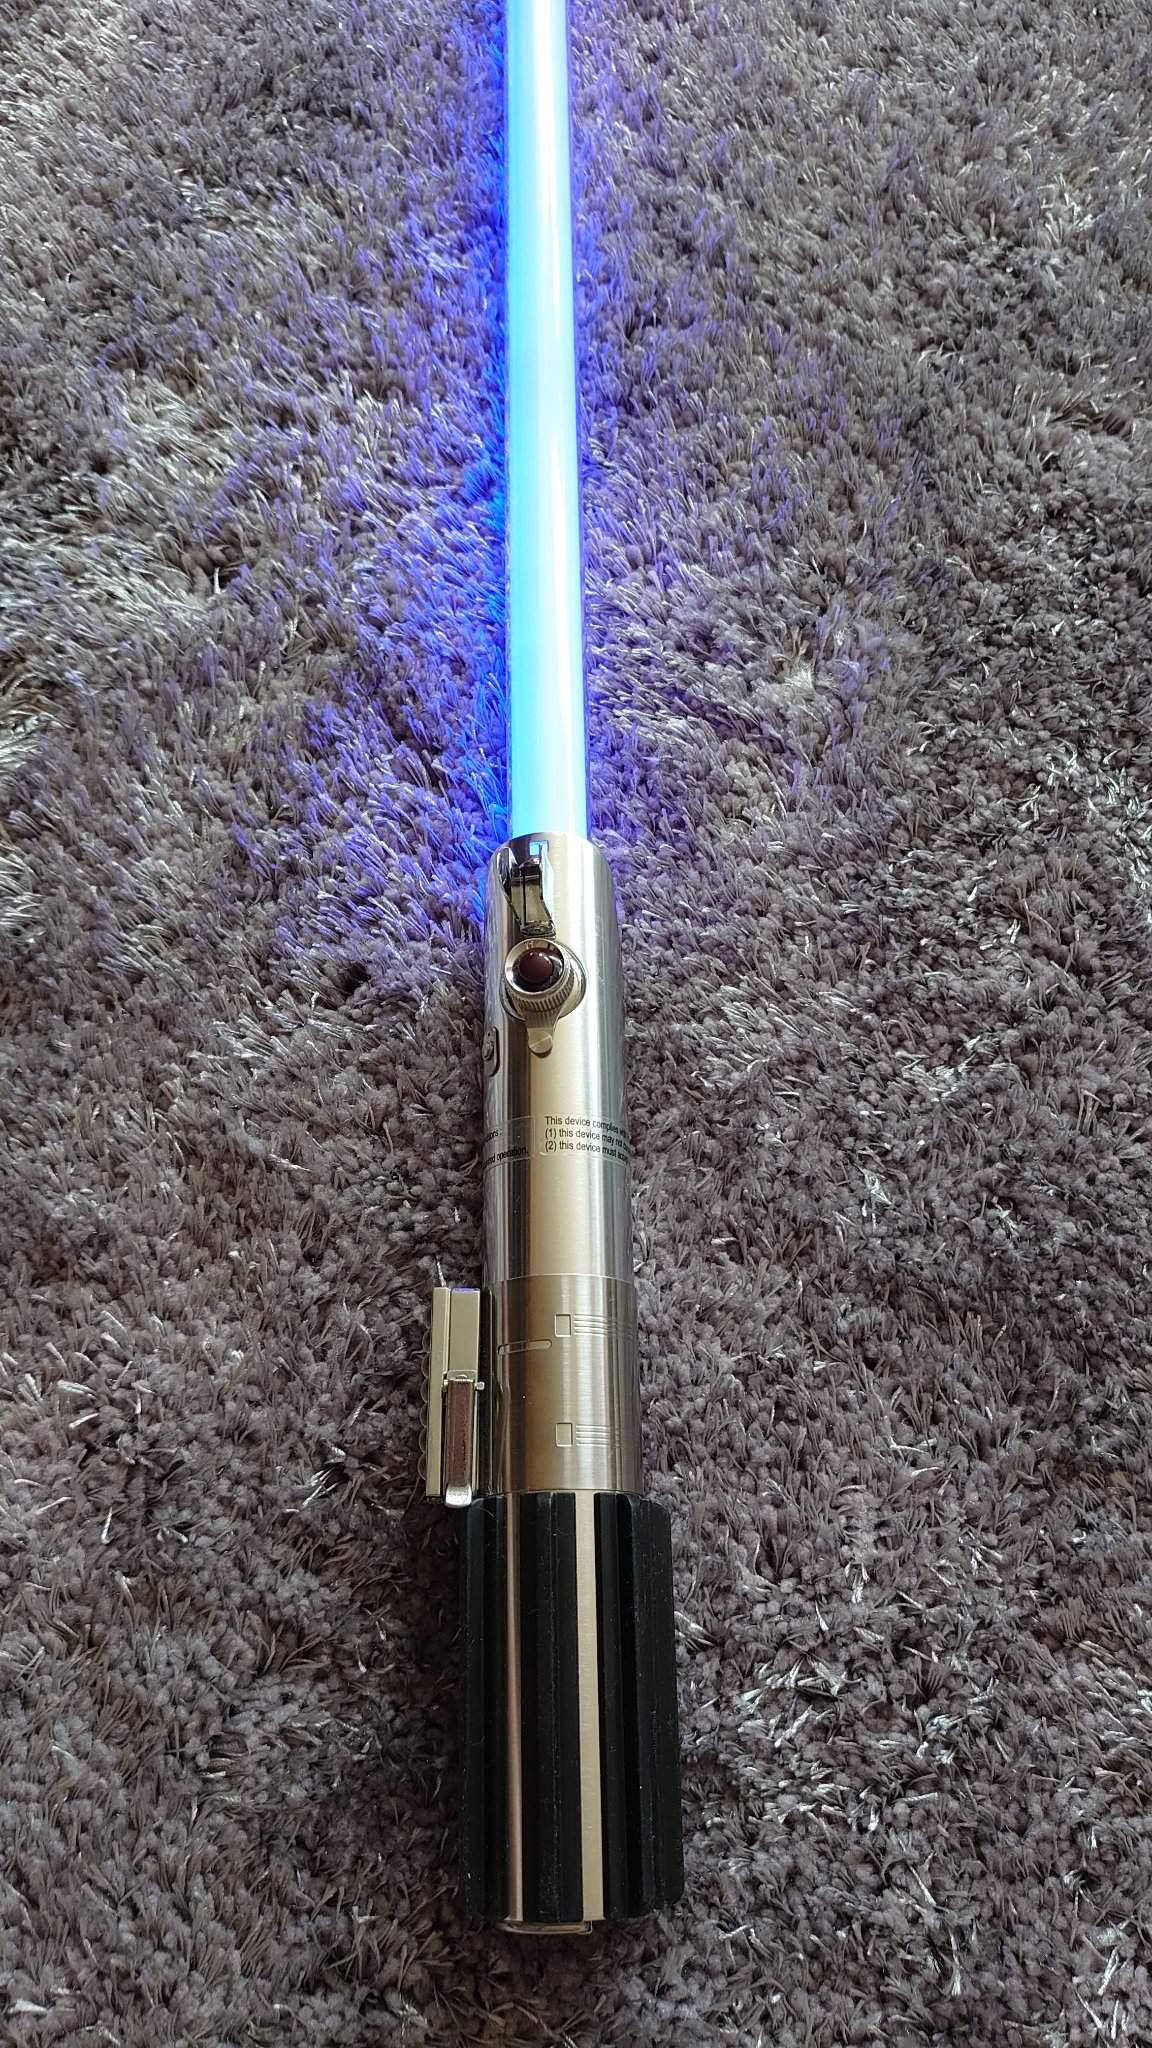 Master Replicas Luke Skywalker Anh Lightsaber Review Star Wars Amino